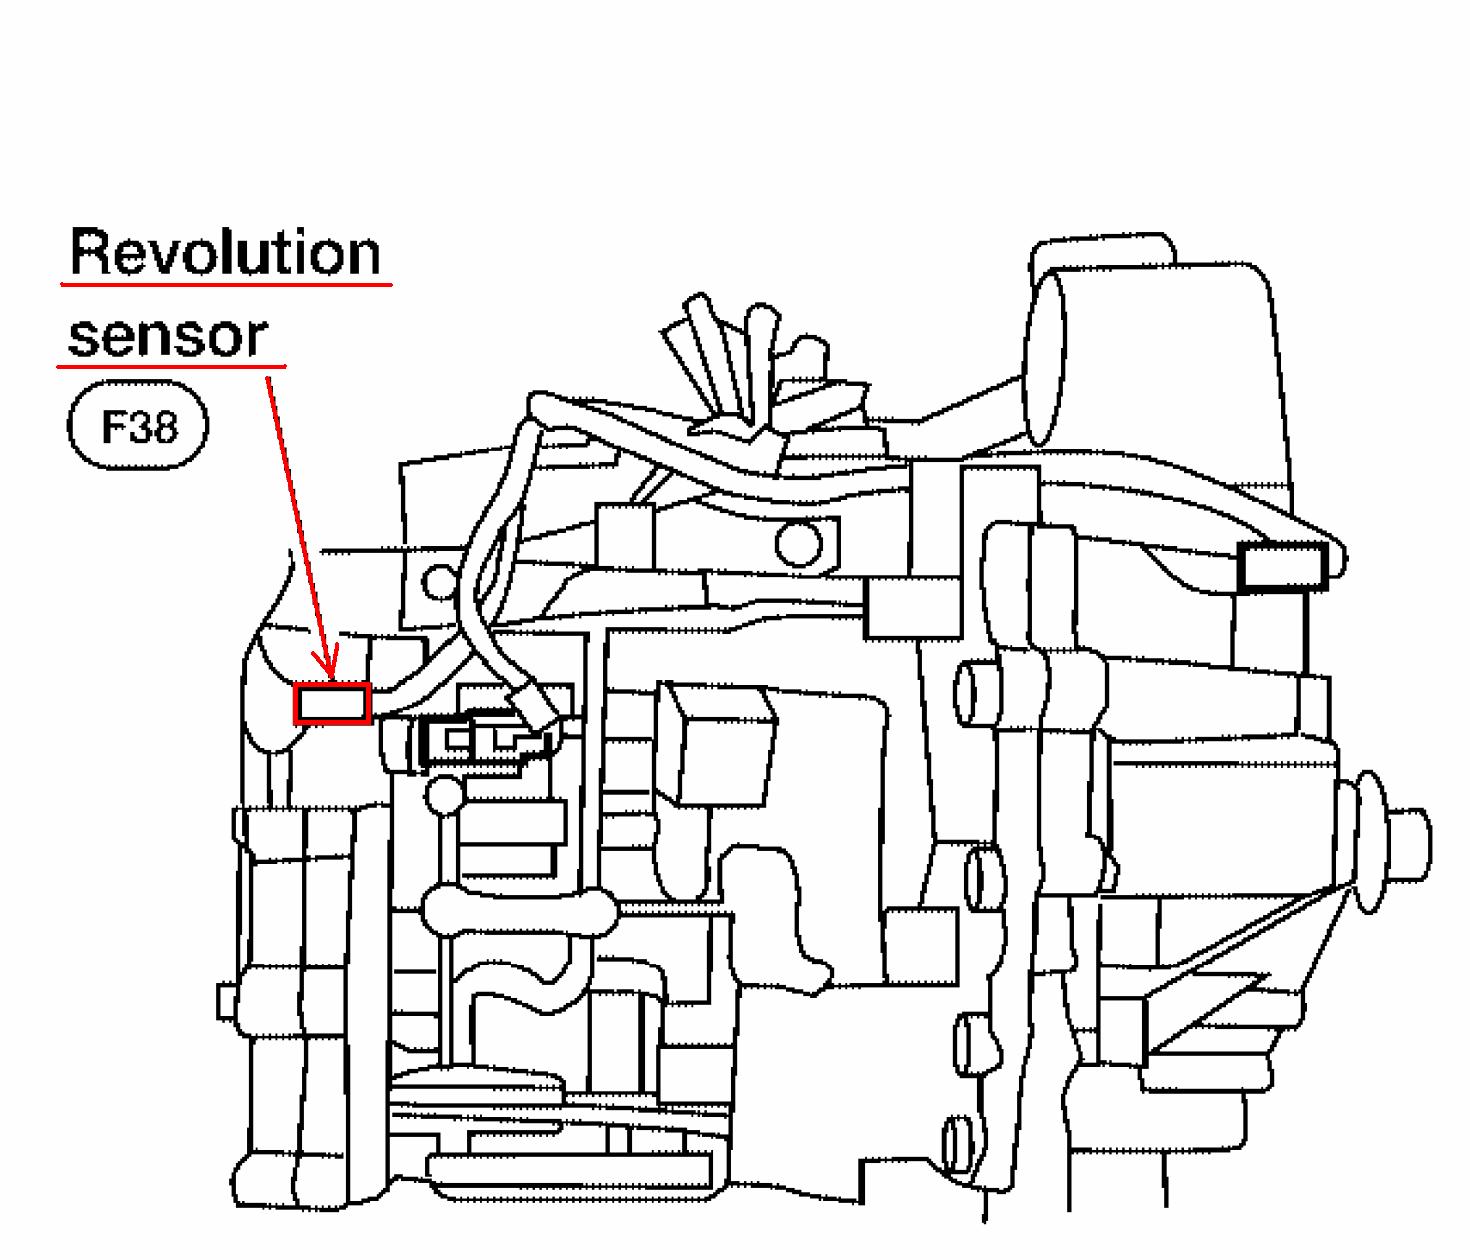 where is the revolution sensor on a 2004 nissan altima 4 cyl rh justanswer com